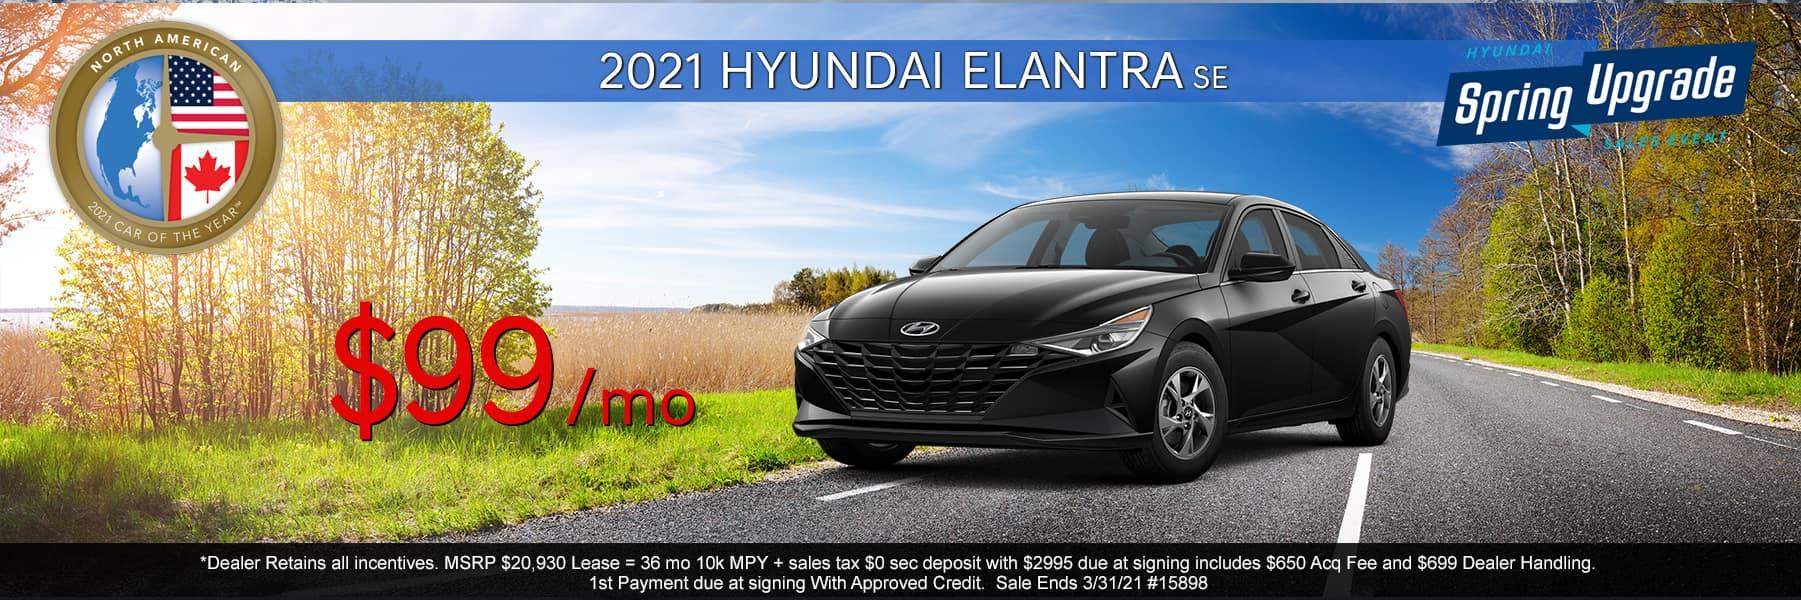 2021-Hyundai-Elantra-Mar21